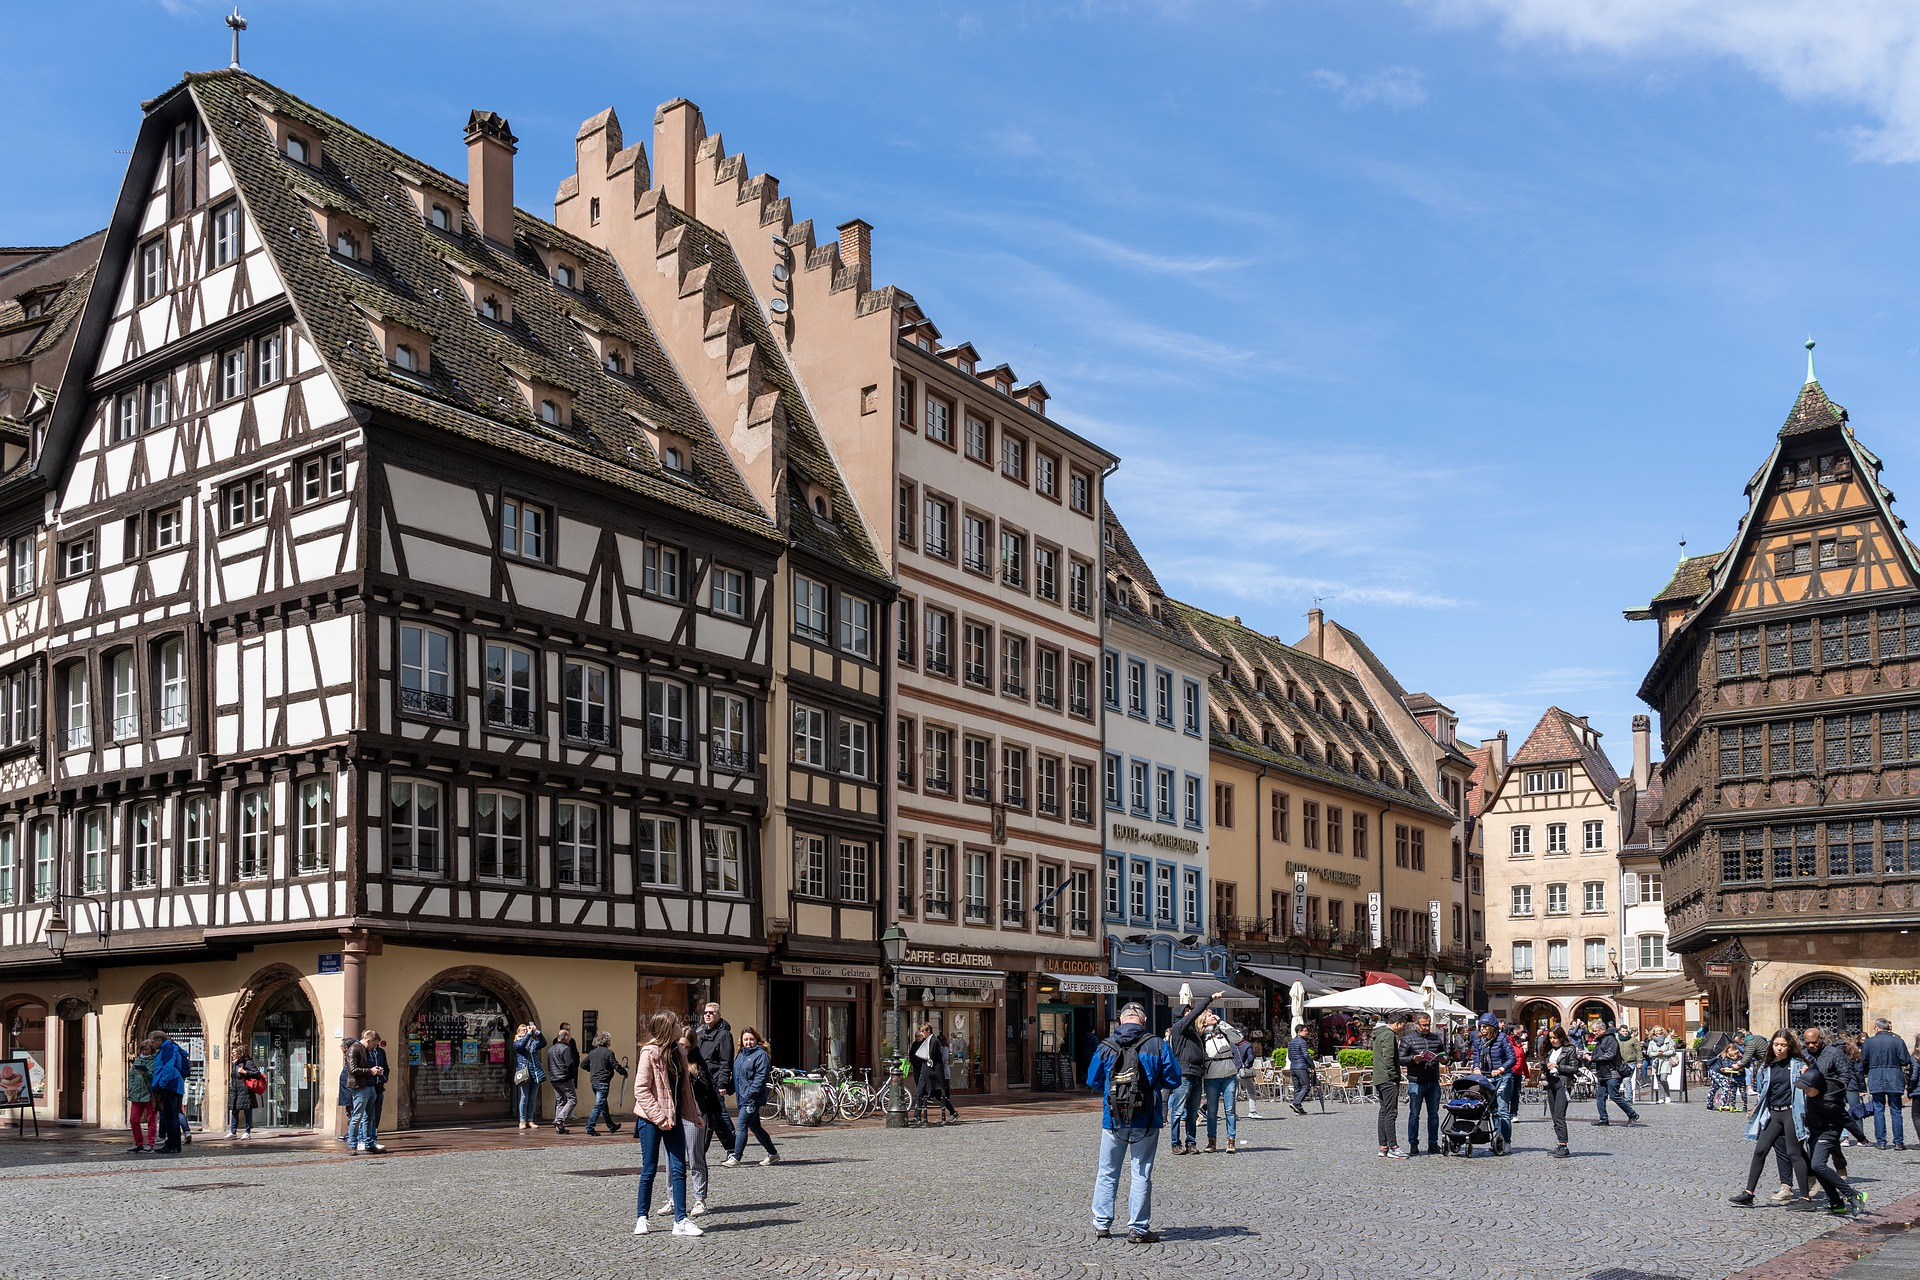 strasbourg-4208001_1920